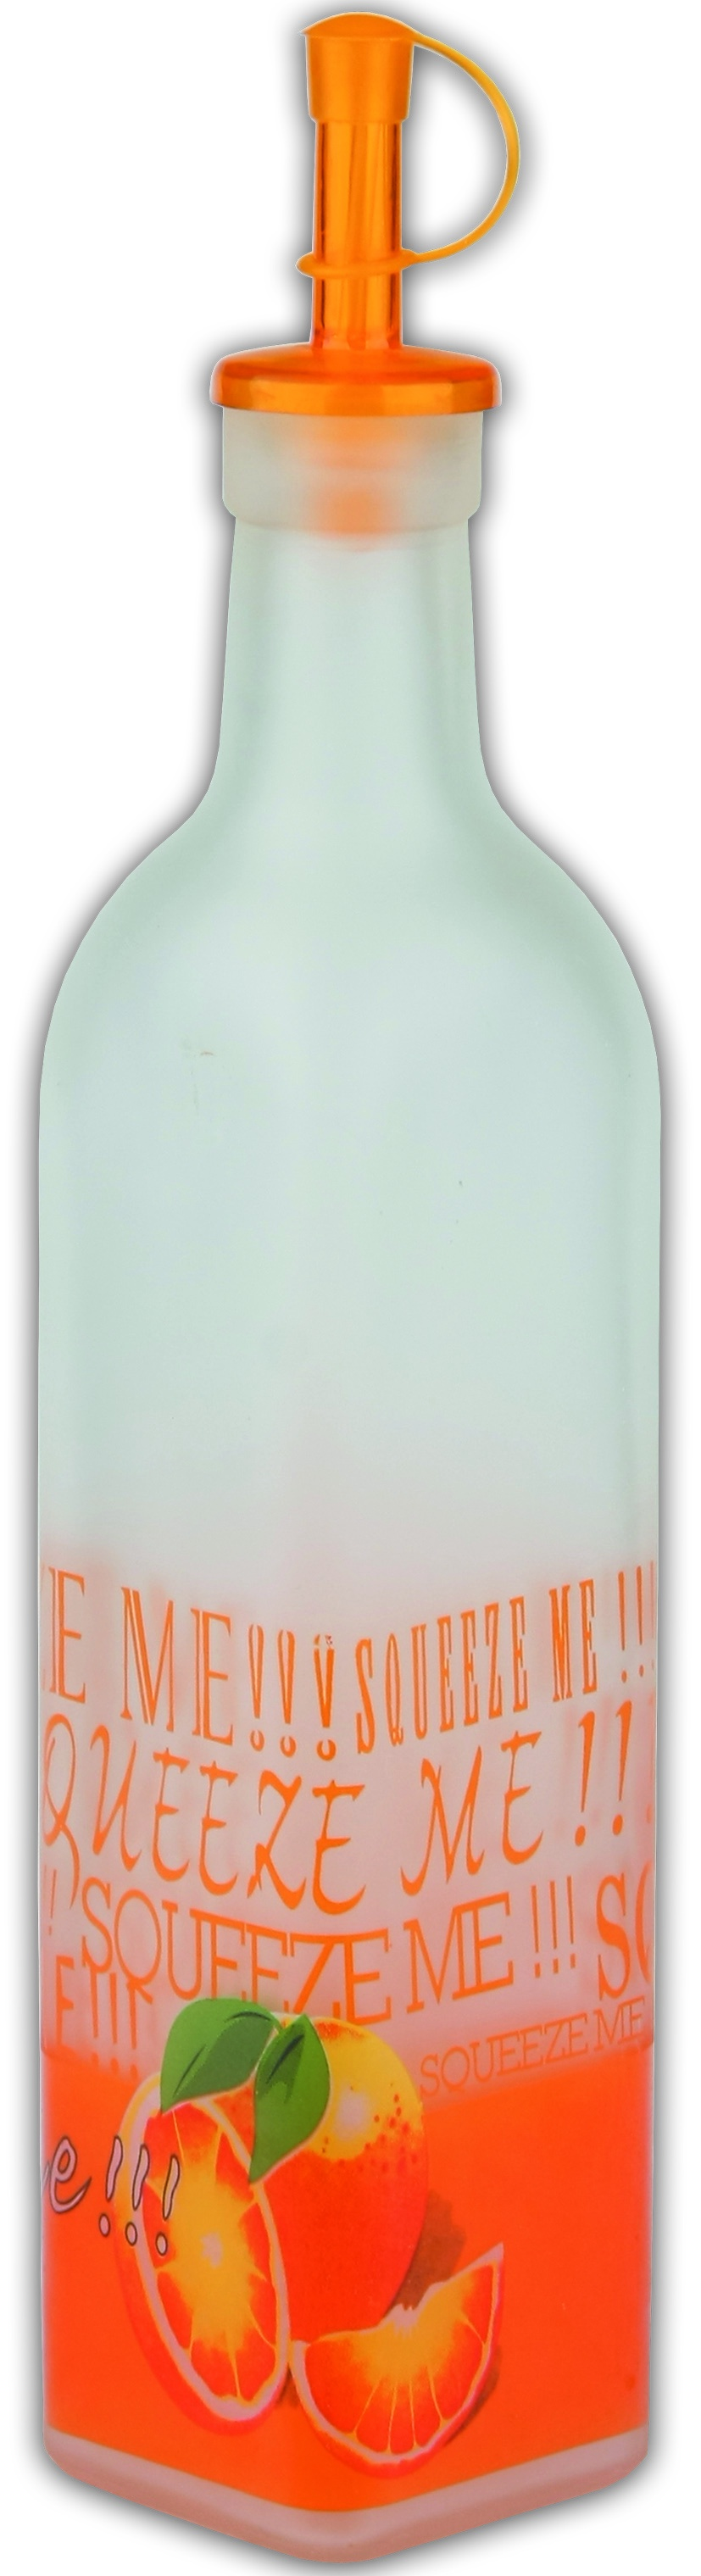 Бутылка для хранения масла Bohmann 01 - 400 BHG (апельсин), с пробкой, 0,5 л бутылка для масла ceramiche viva фреско томаты и перцы 0 4 л